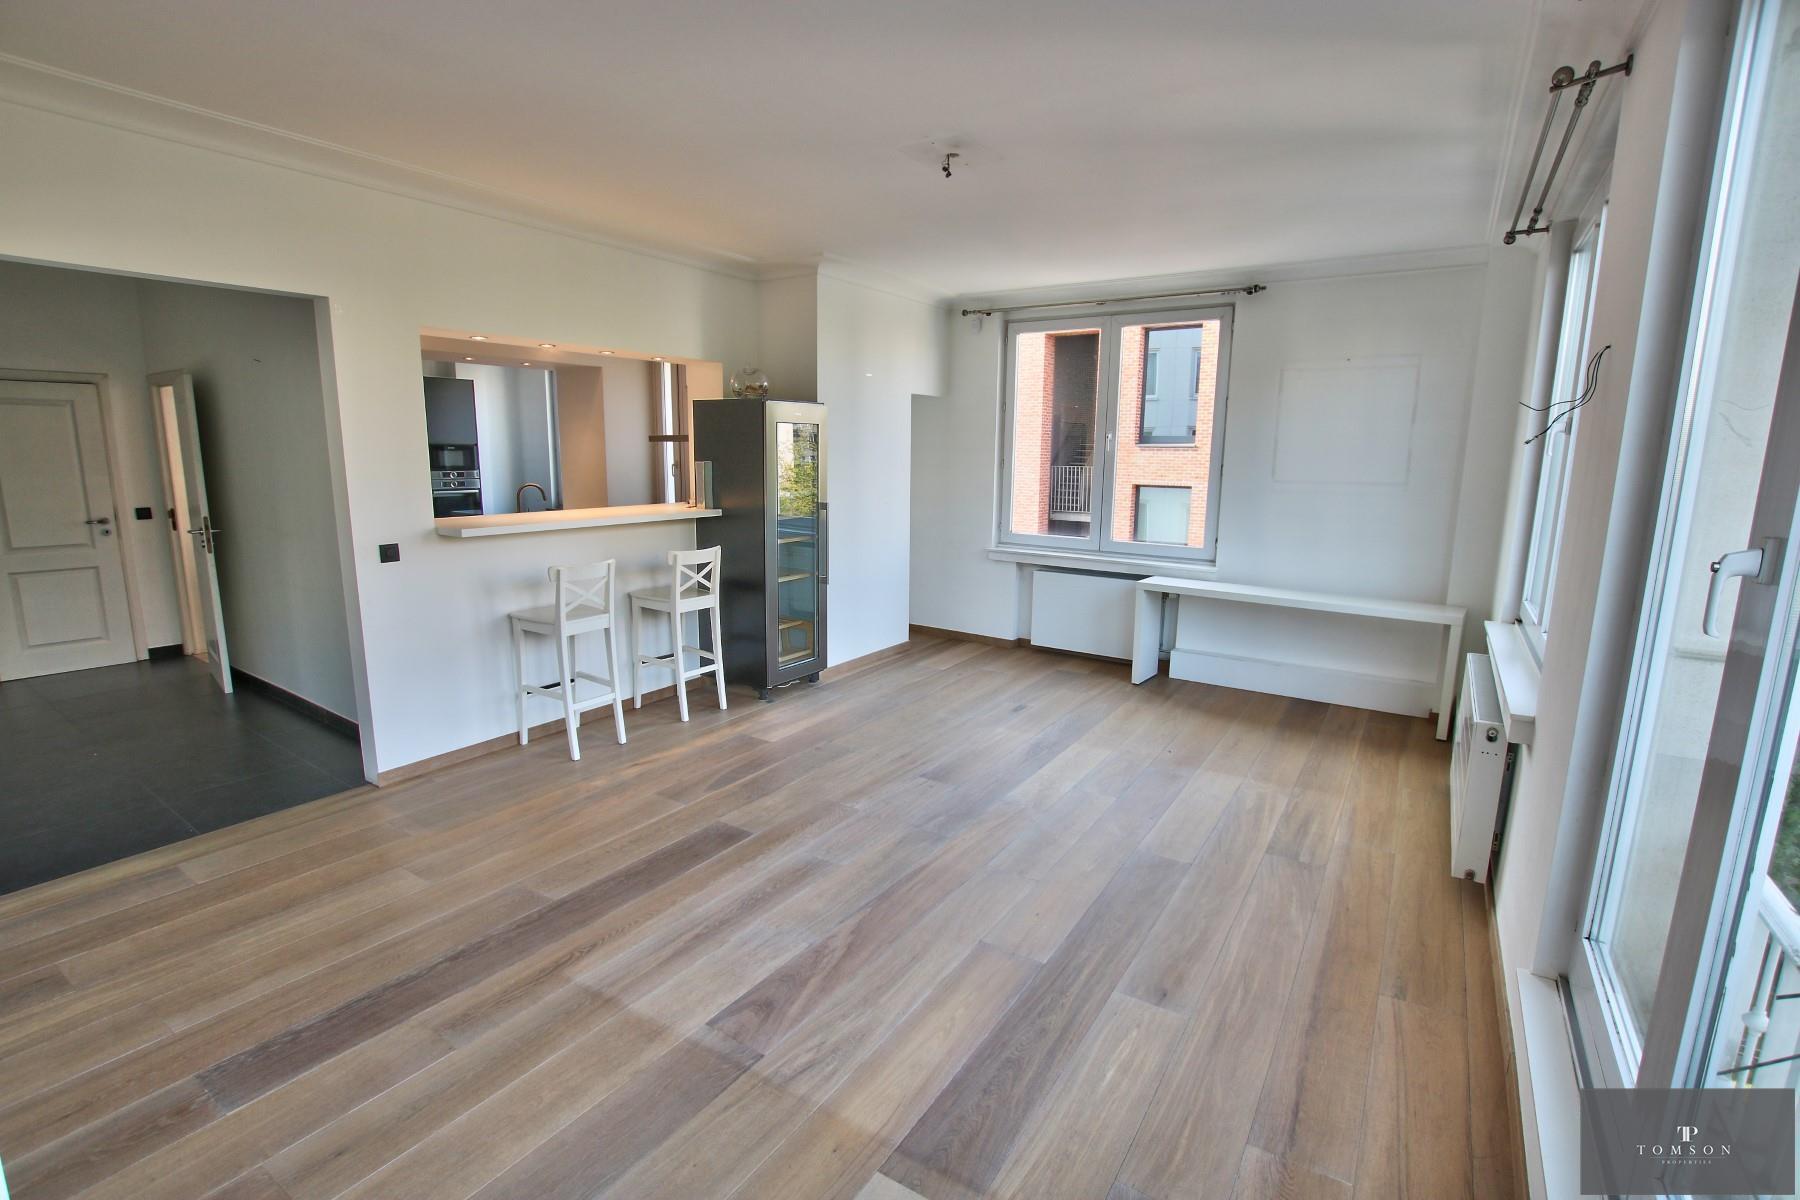 Flat - Etterbeek - #4154759-2